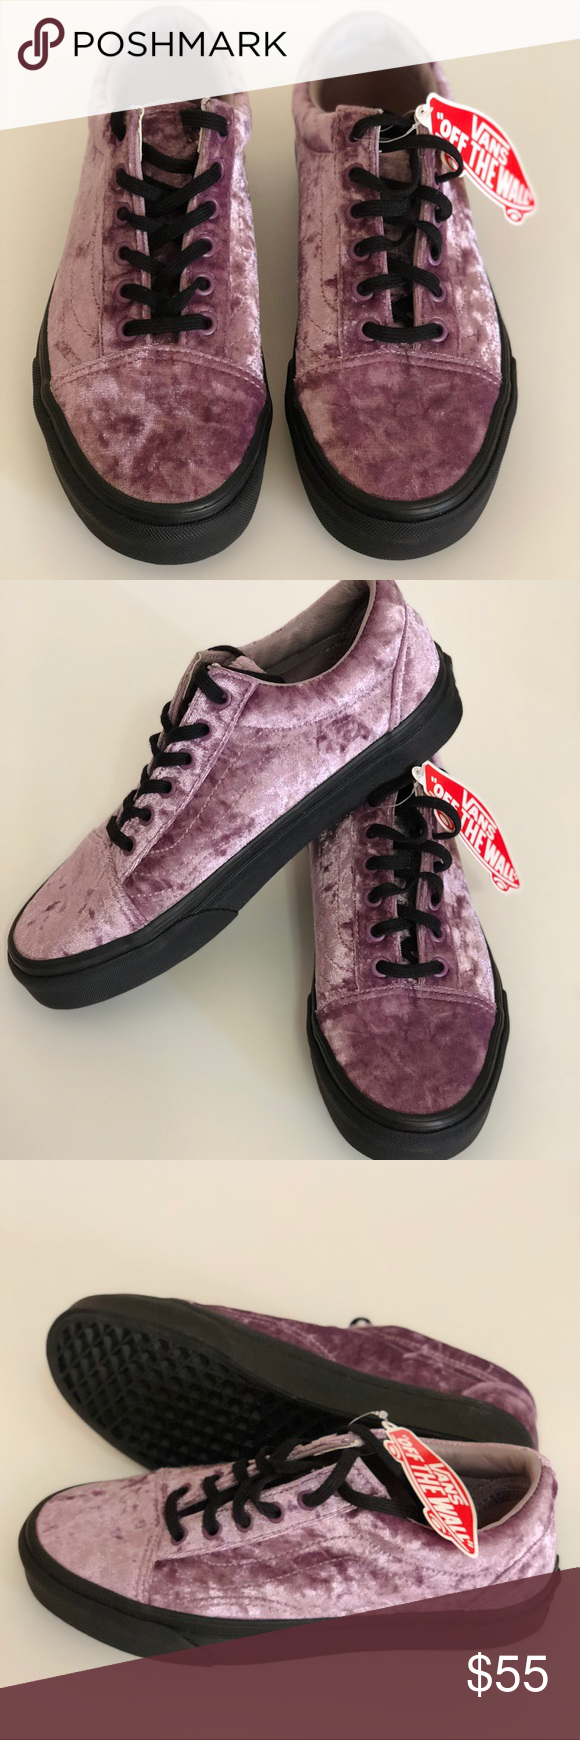 198ead6ca2 Vans Old Skool Velvet Purple Sea Fog Black Gum NWT Vans Old Skool Velvet  Purple Sea Fog Black Gum Size Women s 10